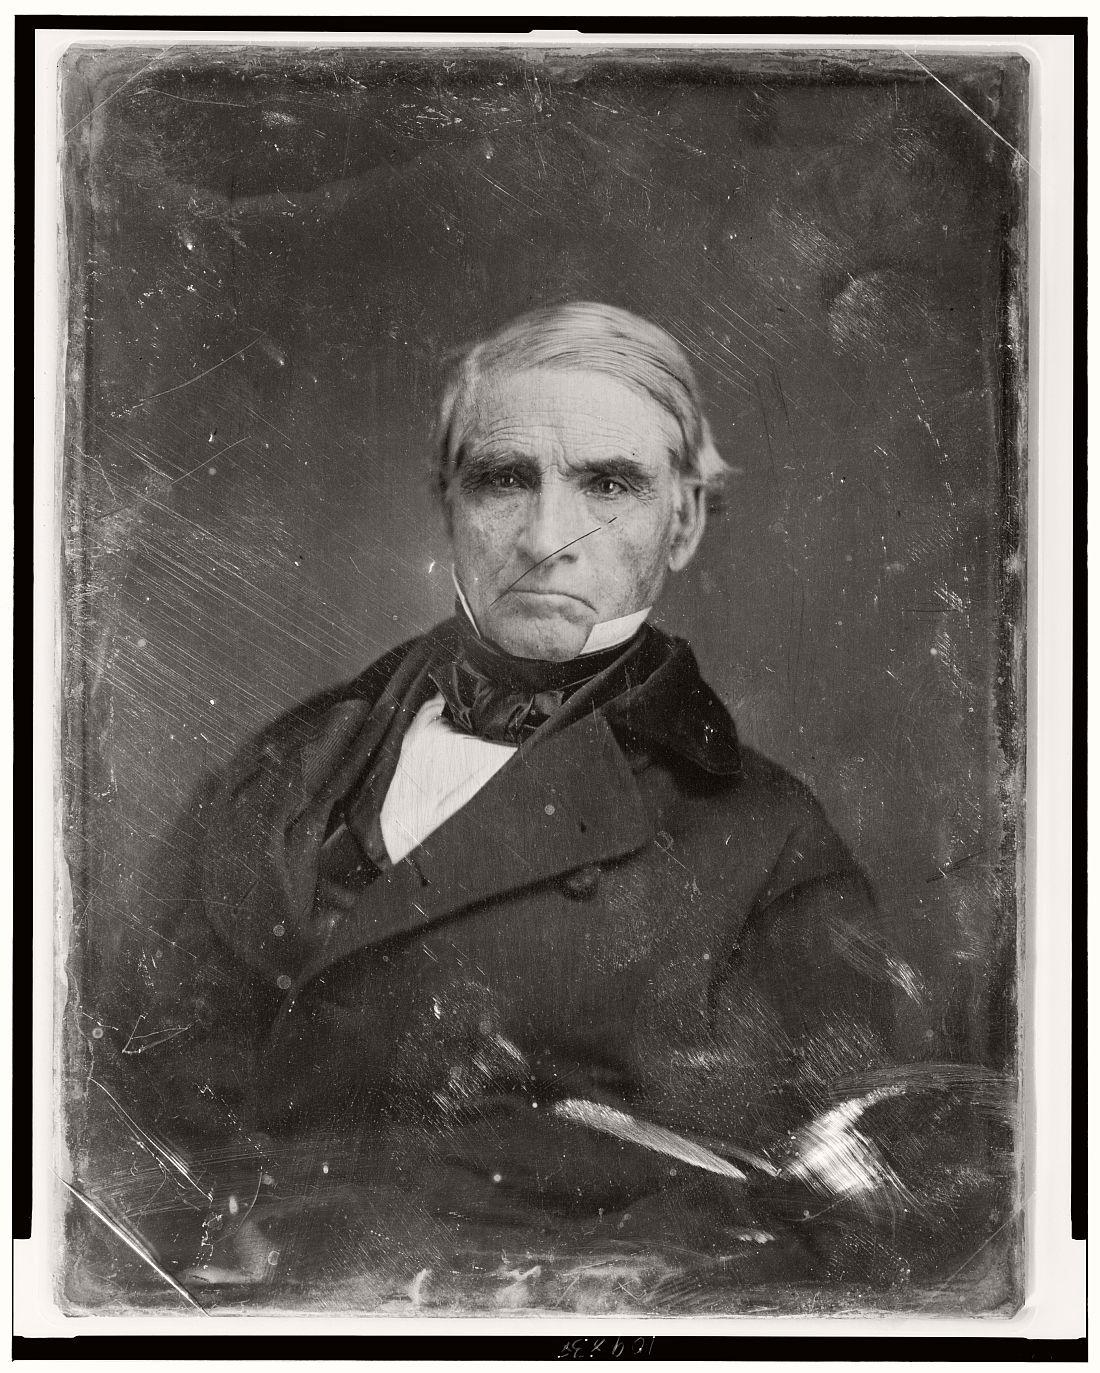 vintage-daguerreotype-portraits-from-xix-century-1844-1860-04